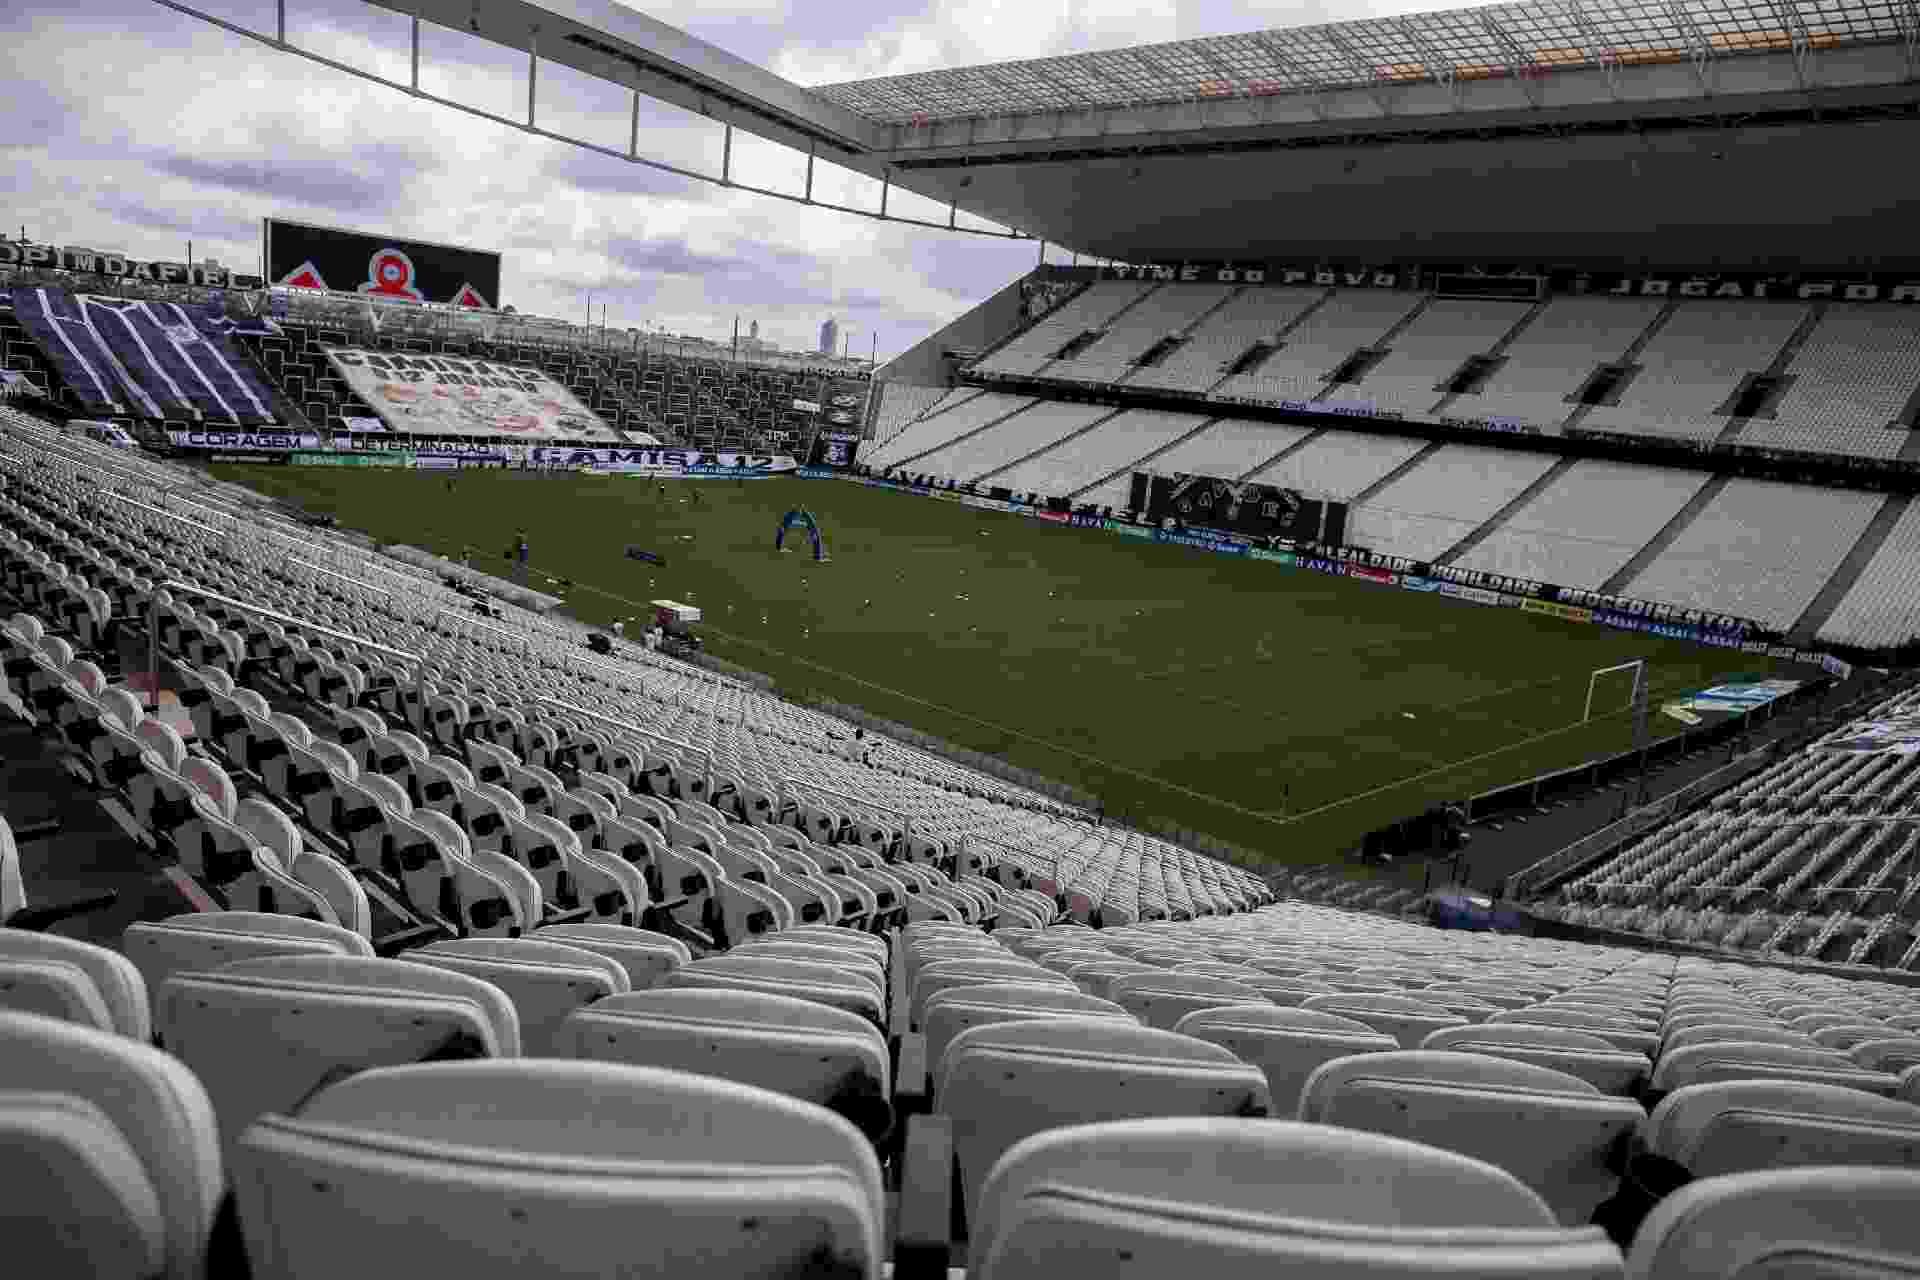 Corinthians enfrenta a Ponte Preta pela Campeonato Paulista - Ettore Chiereguini/AGIF